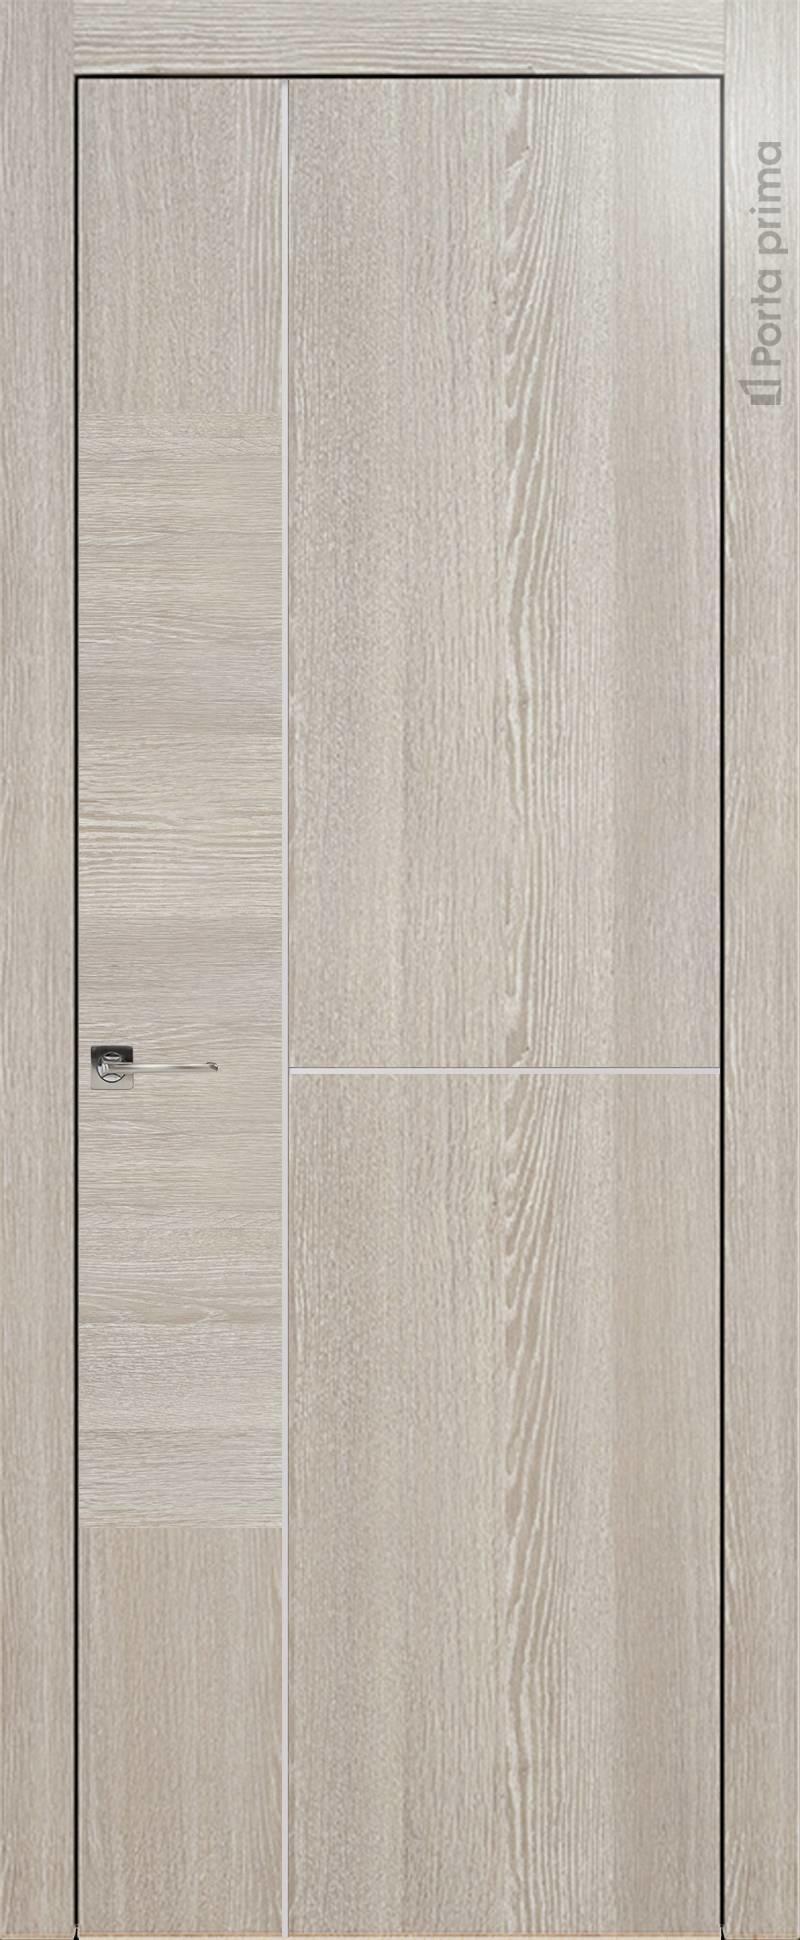 Tivoli Г-1 цвет - Серый дуб Без стекла (ДГ)